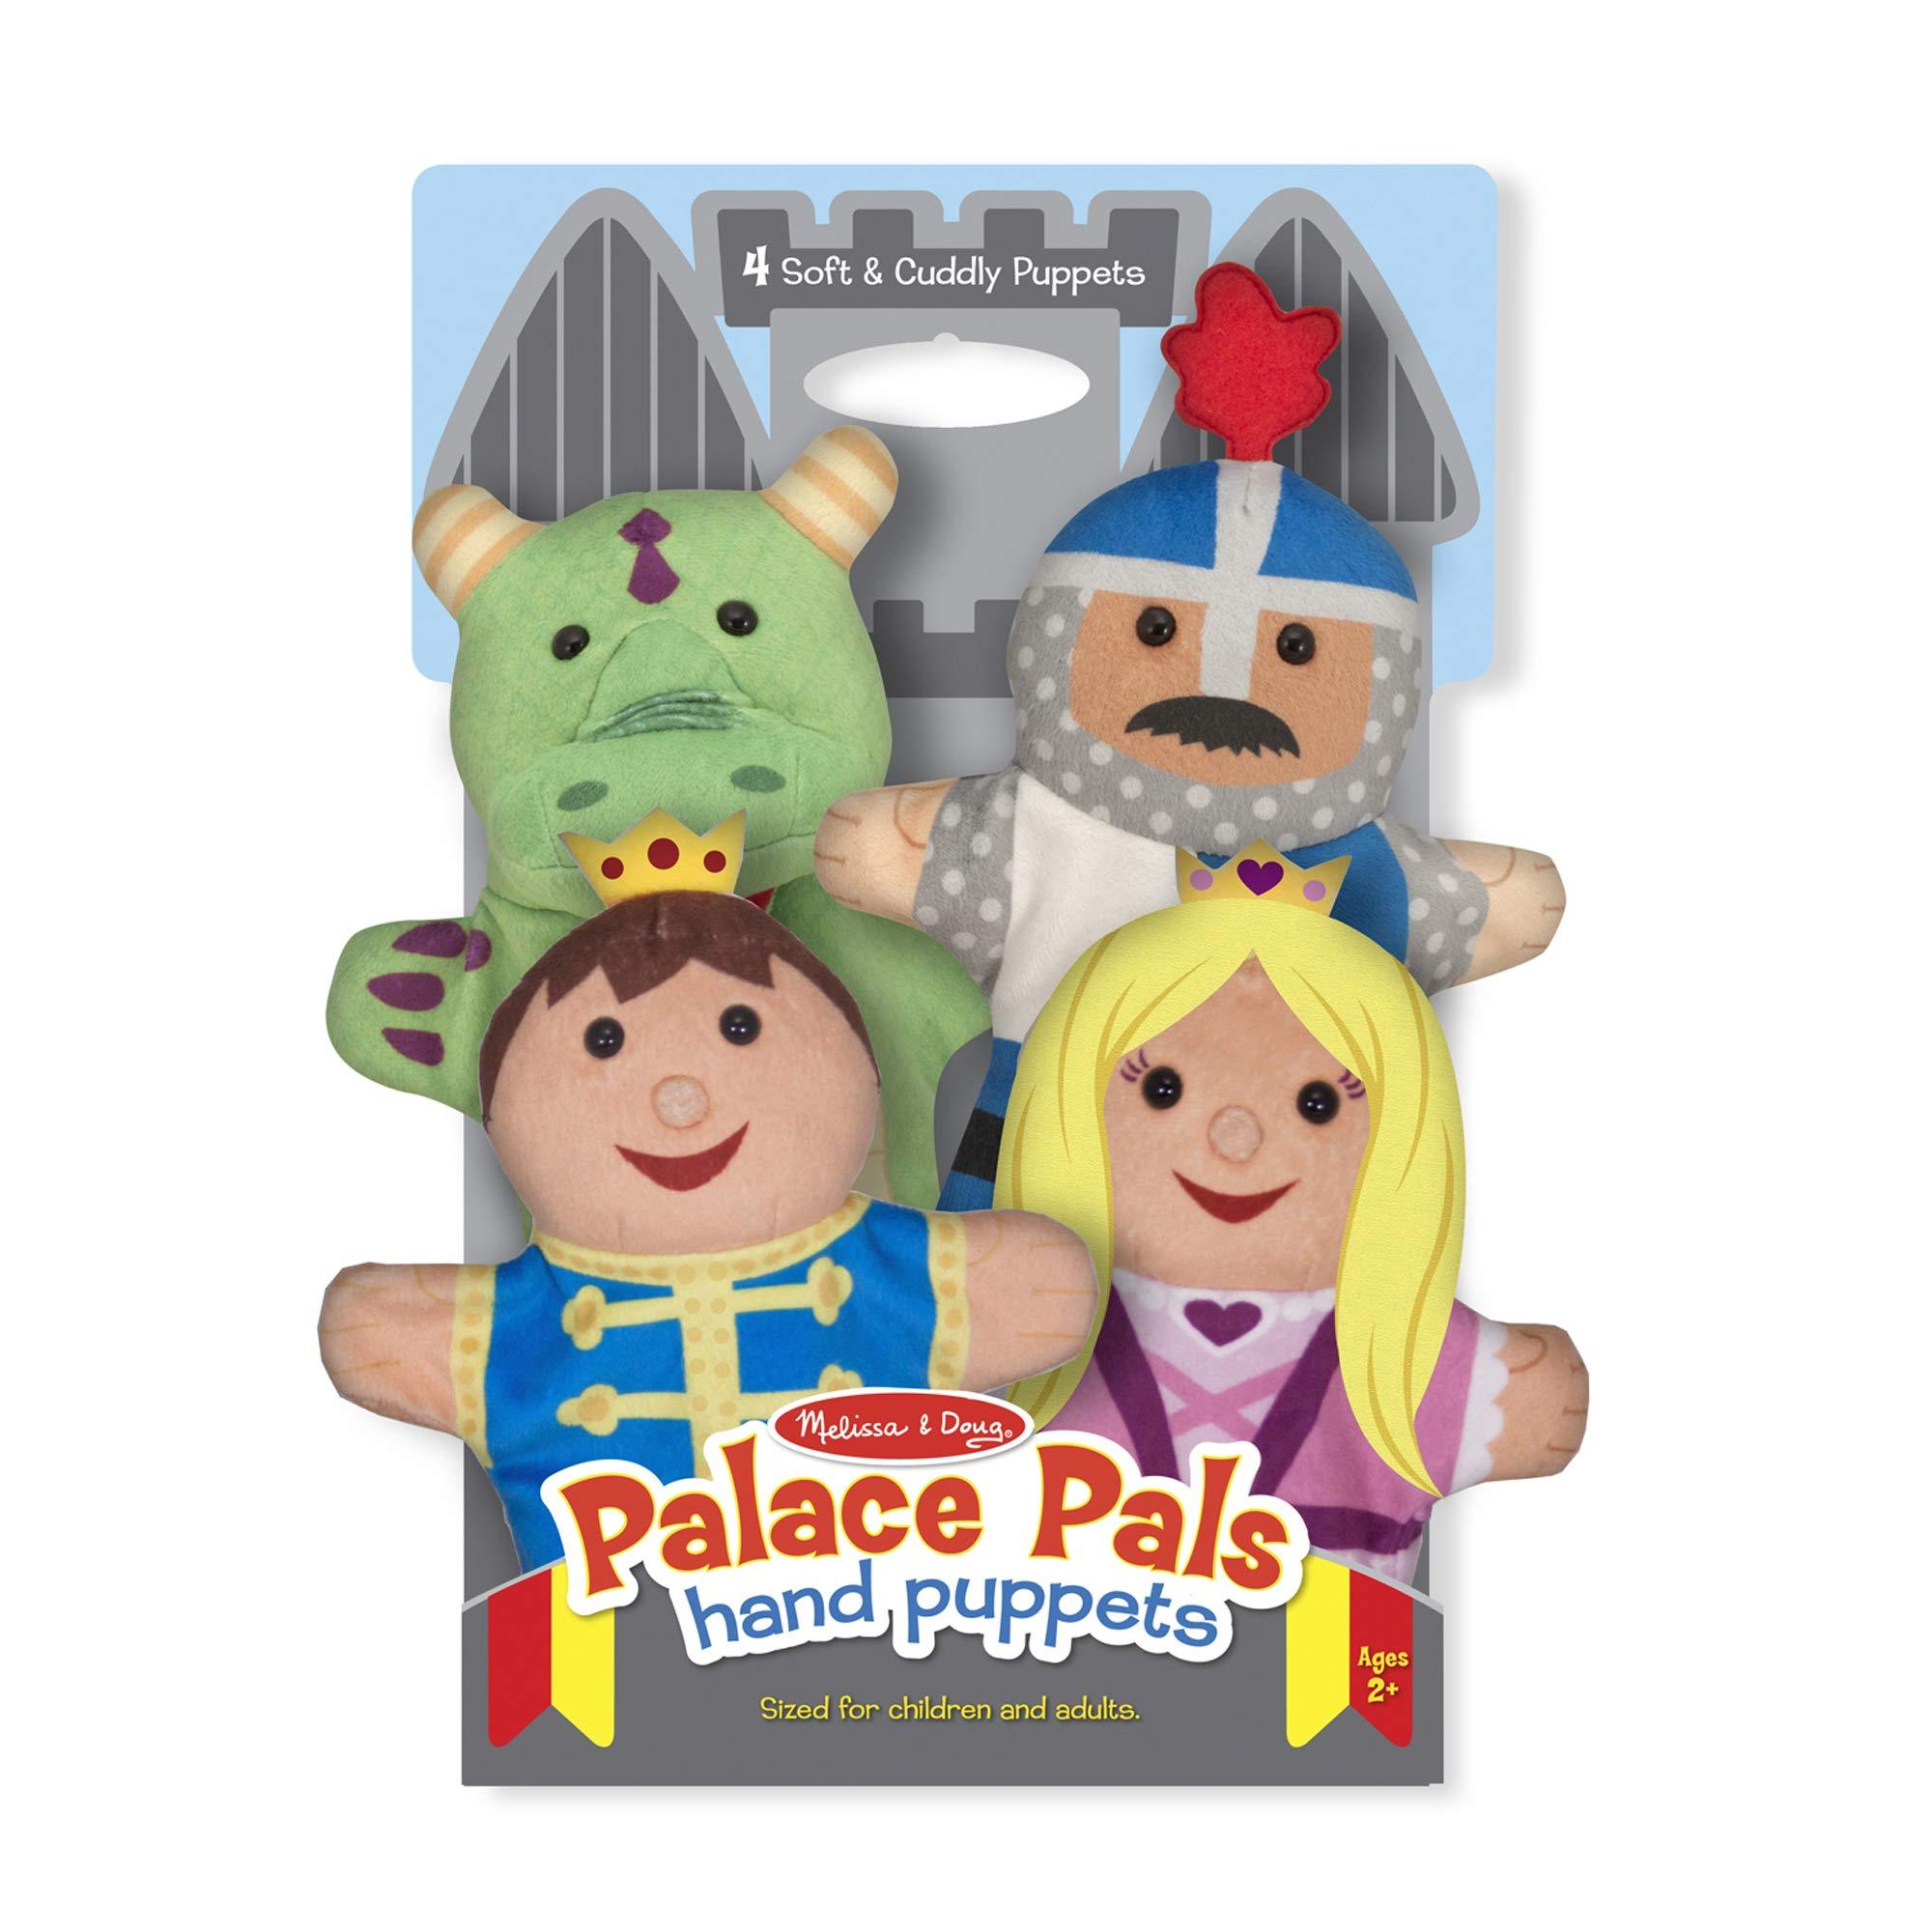 Melissa & Doug Palace Pals Hand Puppets, Puppet Sets, Prince, Princess, Knight, and Dragon, Soft Plush Material, Set of 4, 14'' H x 8.5'' W x 2'' L by Melissa & Doug